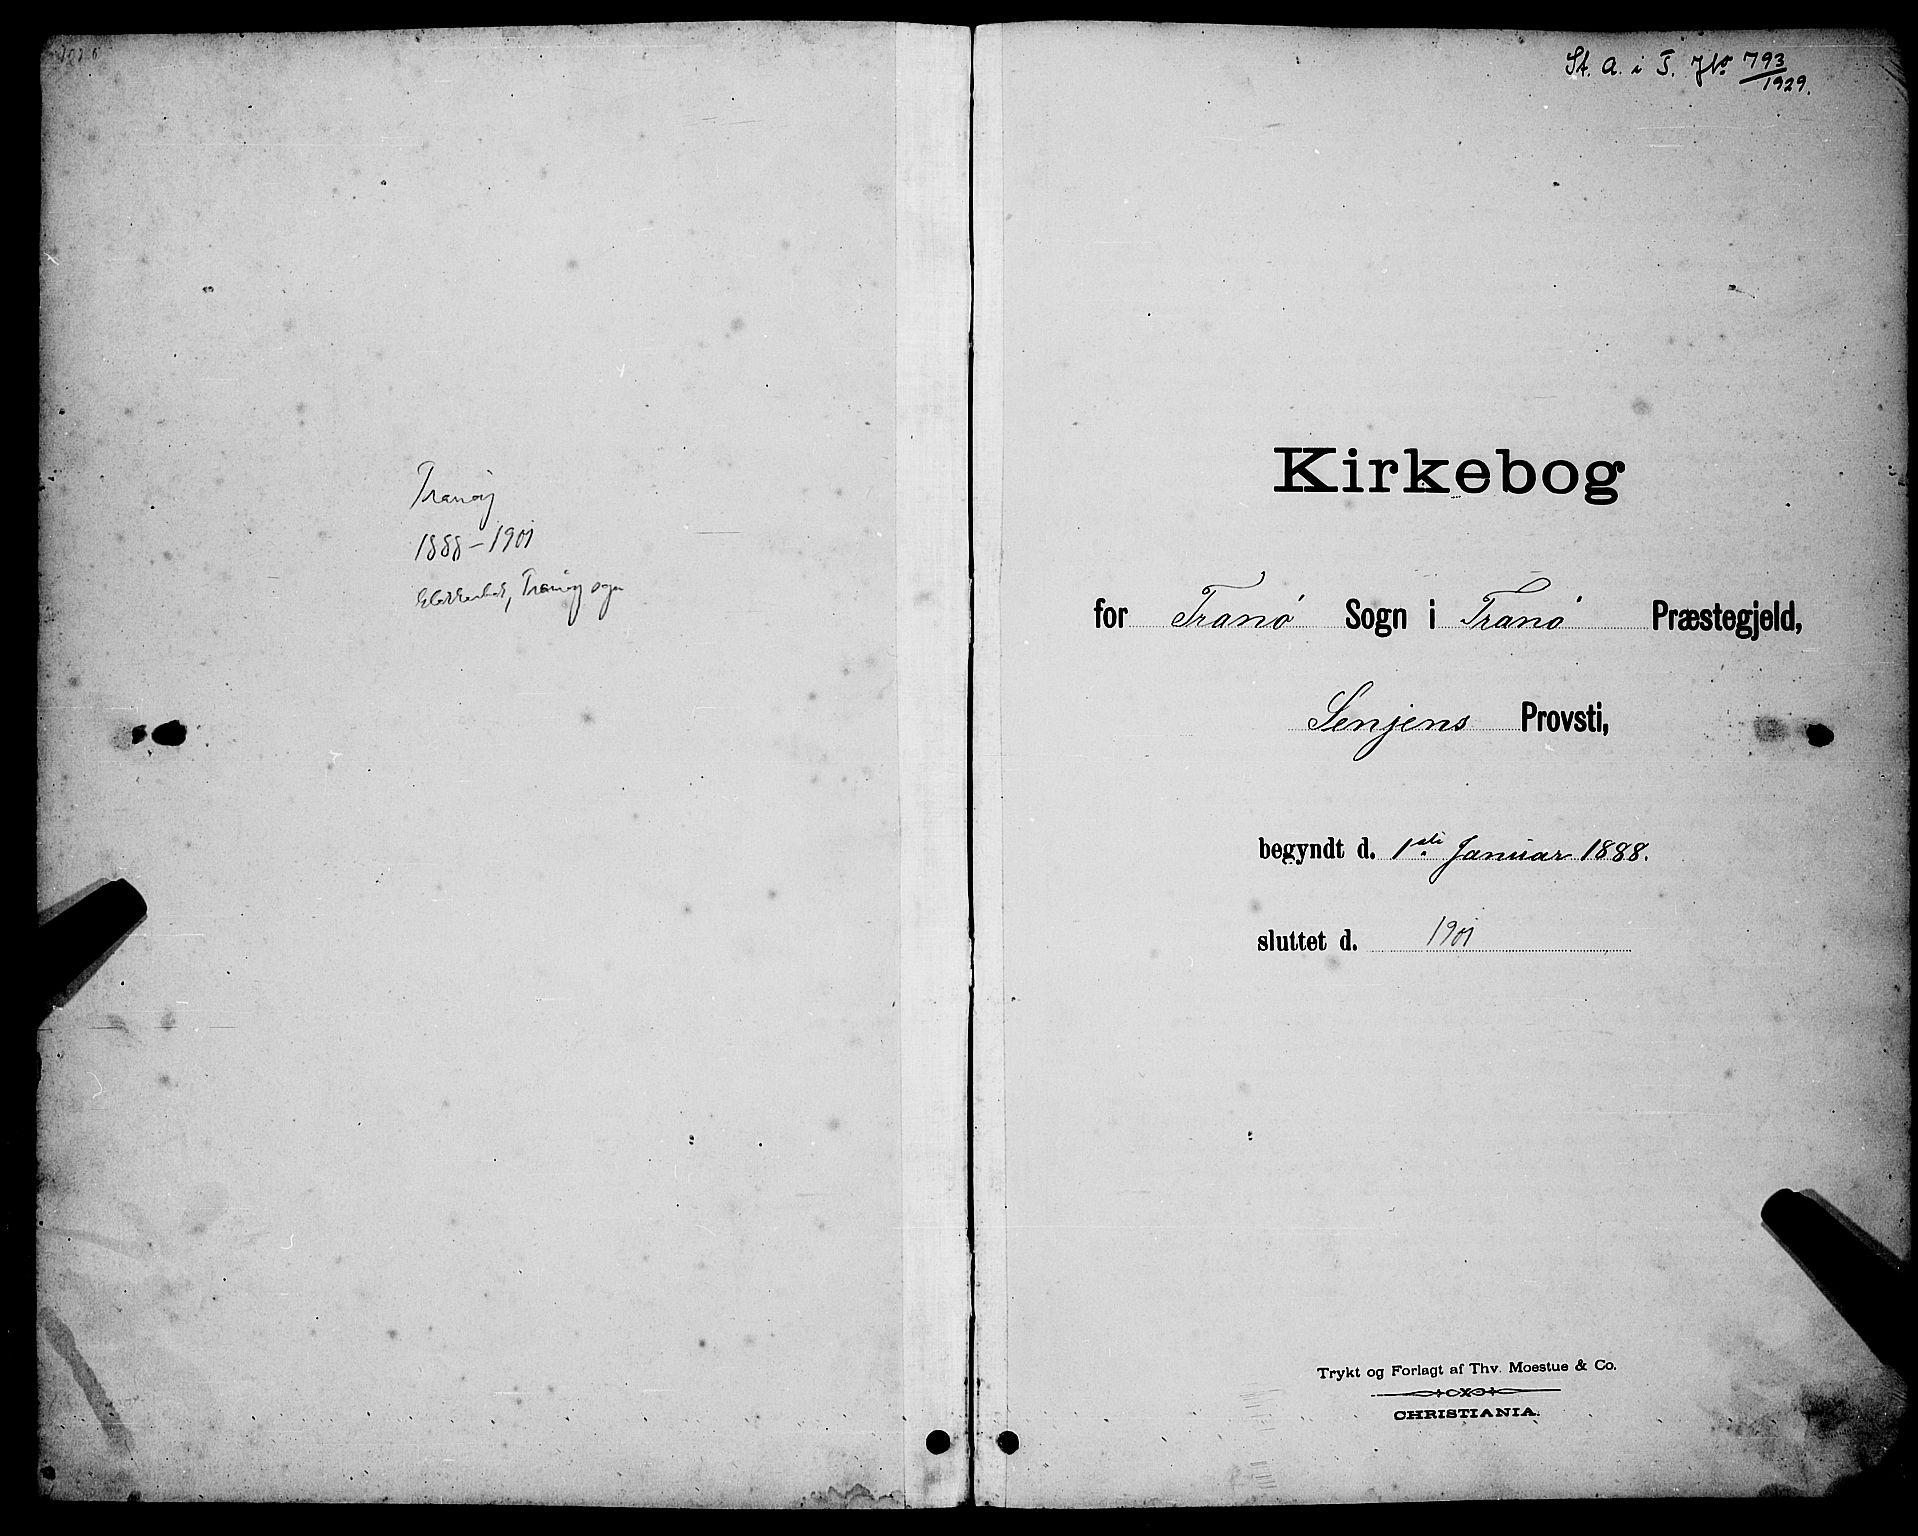 SATØ, Tranøy sokneprestkontor, I/Ia/Iab/L0004klokker: Klokkerbok nr. 4, 1888-1901